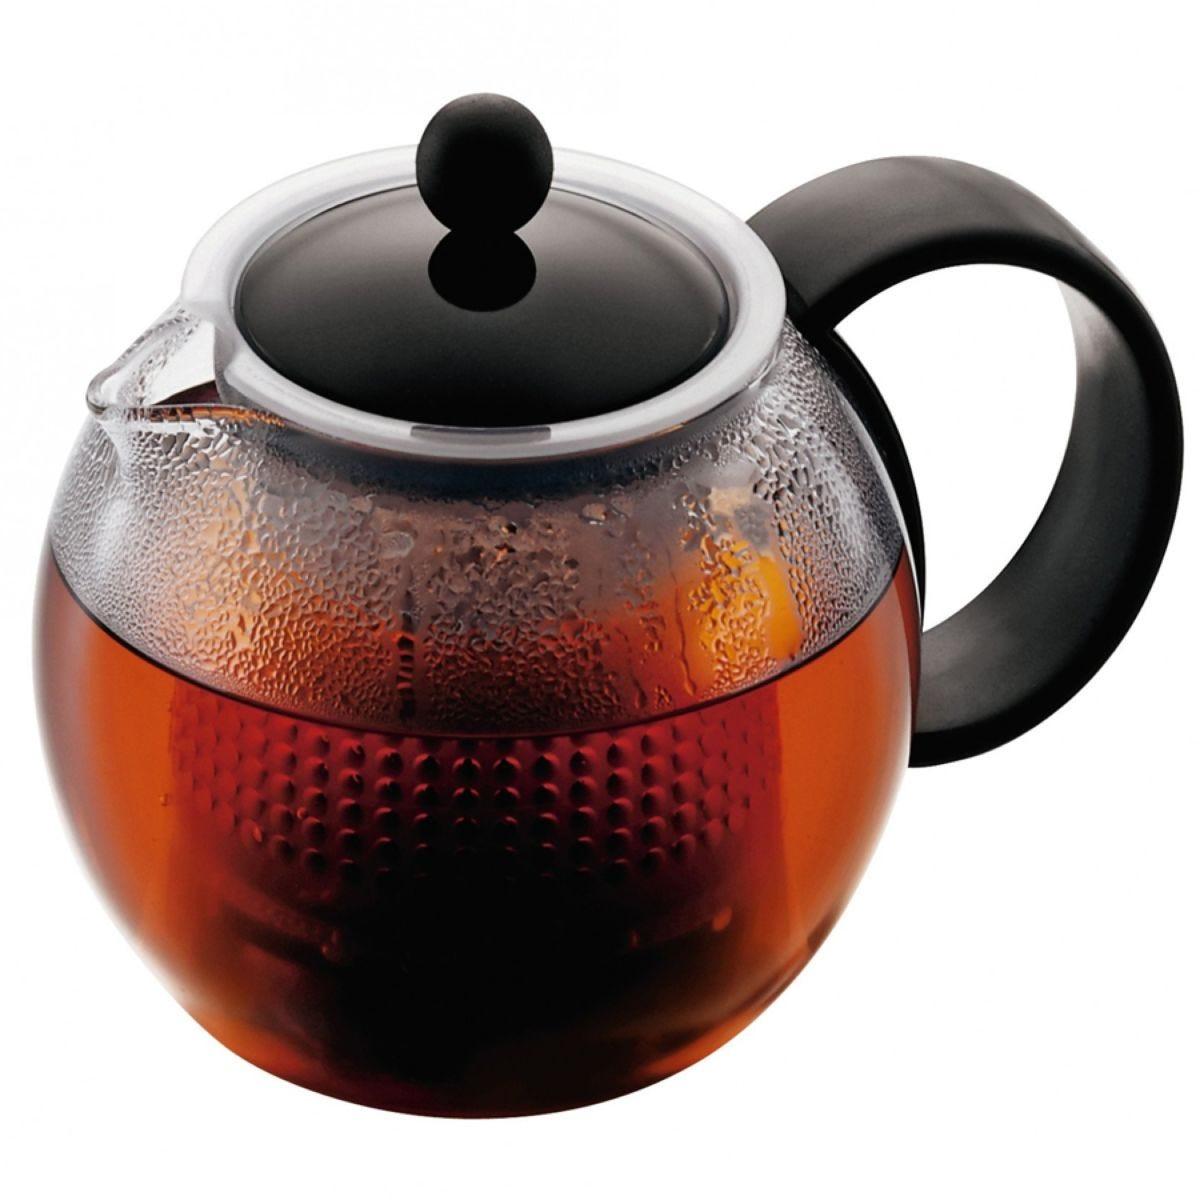 Bodum Assam 1L Glass Infuser Teapot